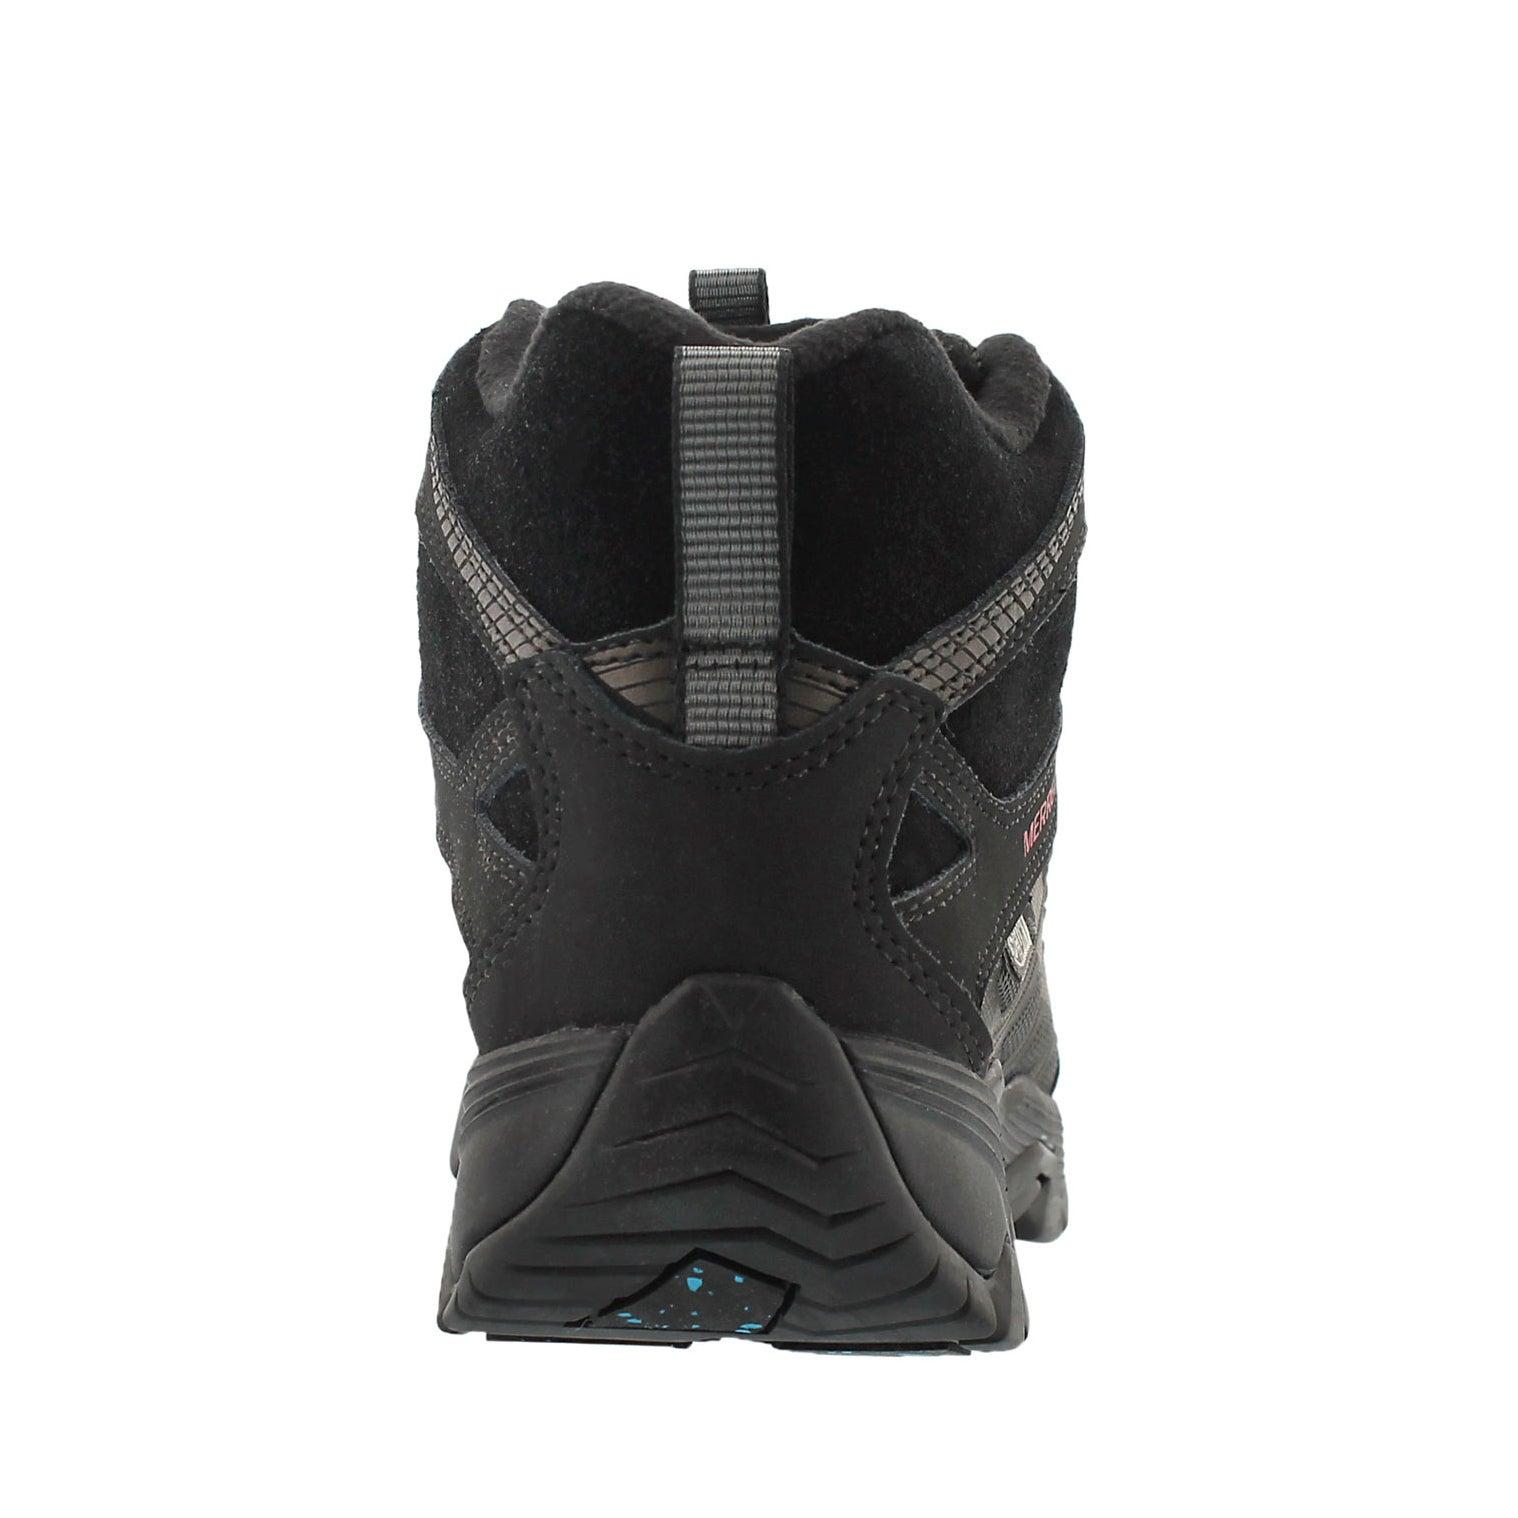 Mns Moab Fst Ice black hiking boot